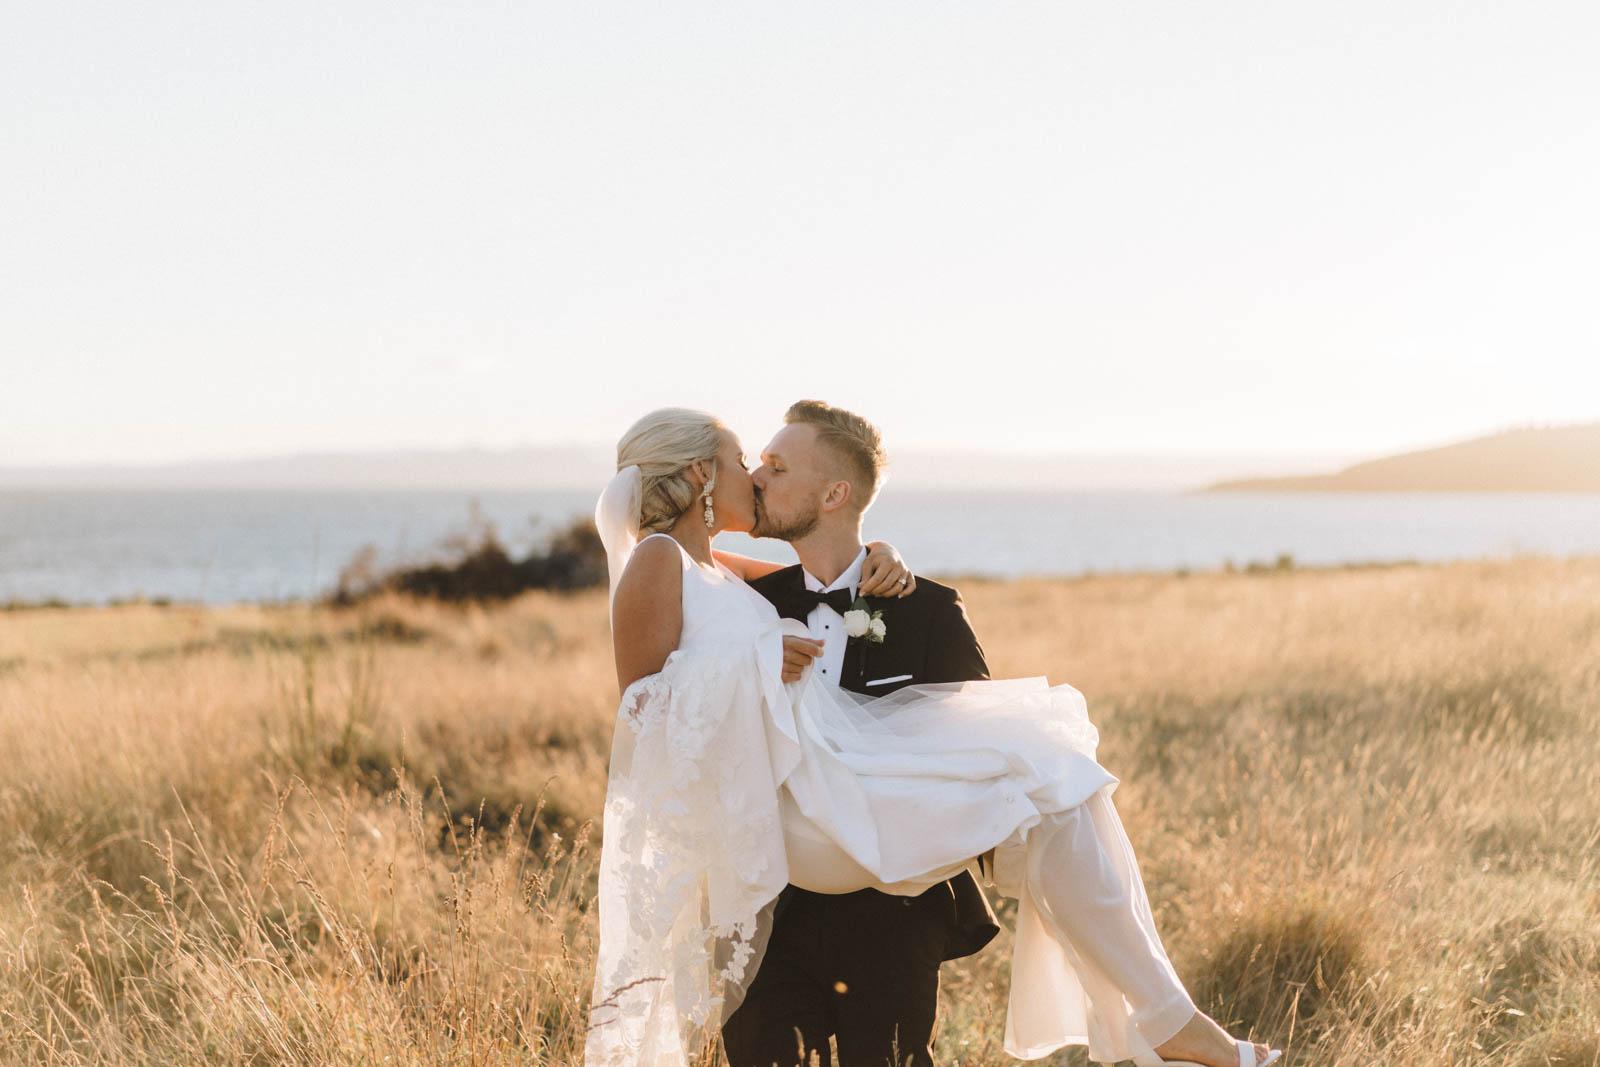 newfound-k-s-hilton-taupo-wedding-photographer-076